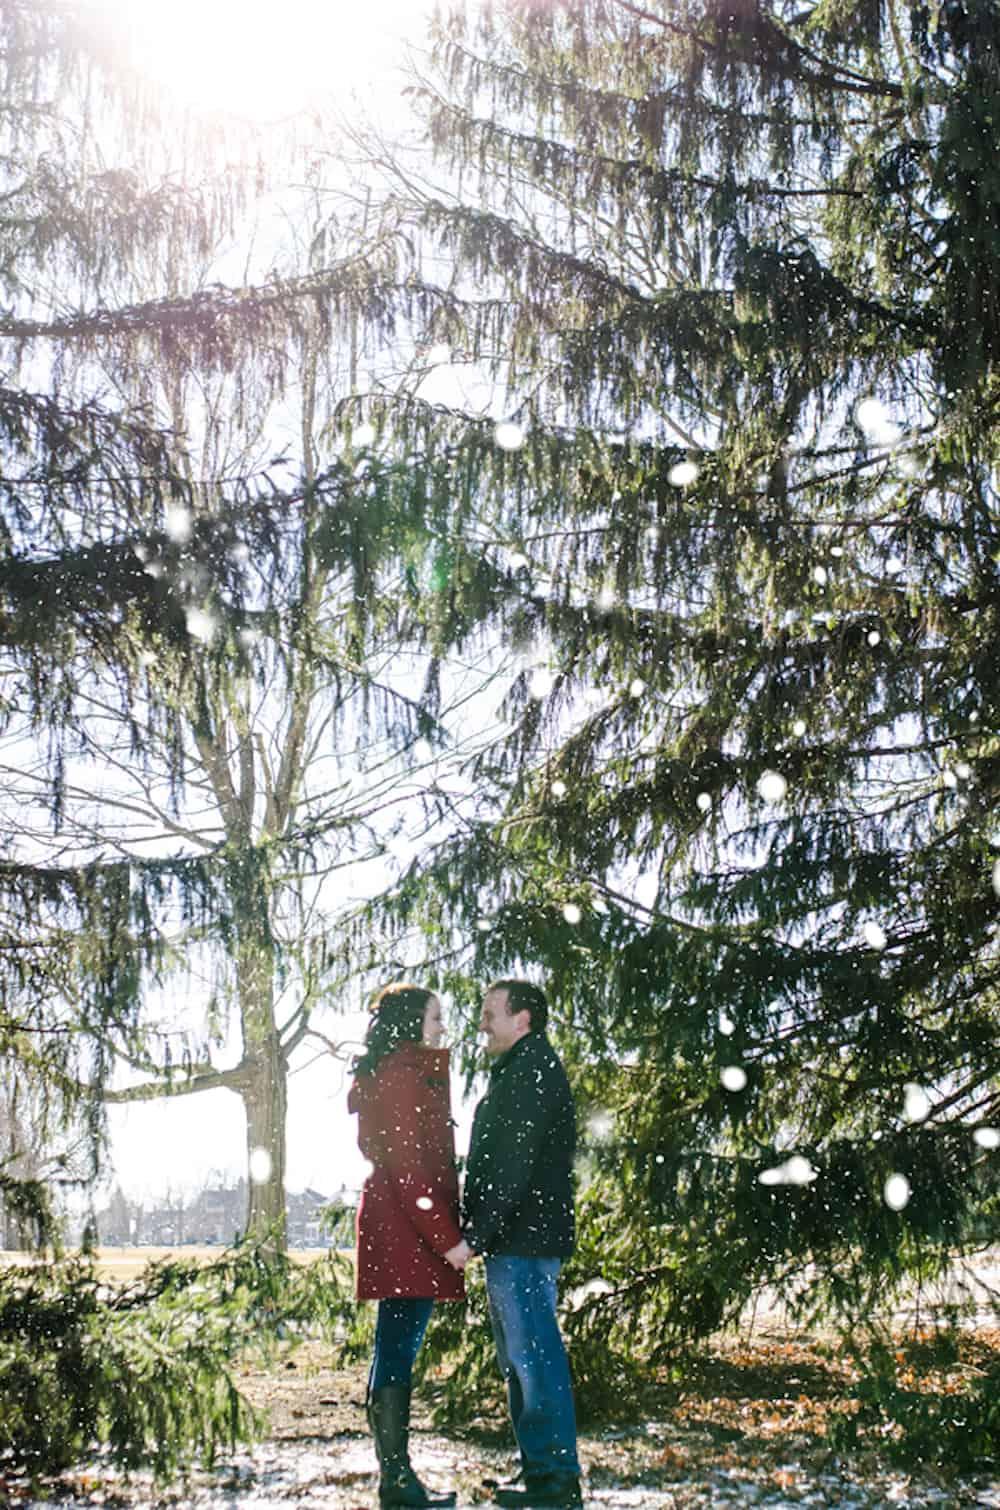 10a-marotti_marotti_heather_marie_photography_snow_low